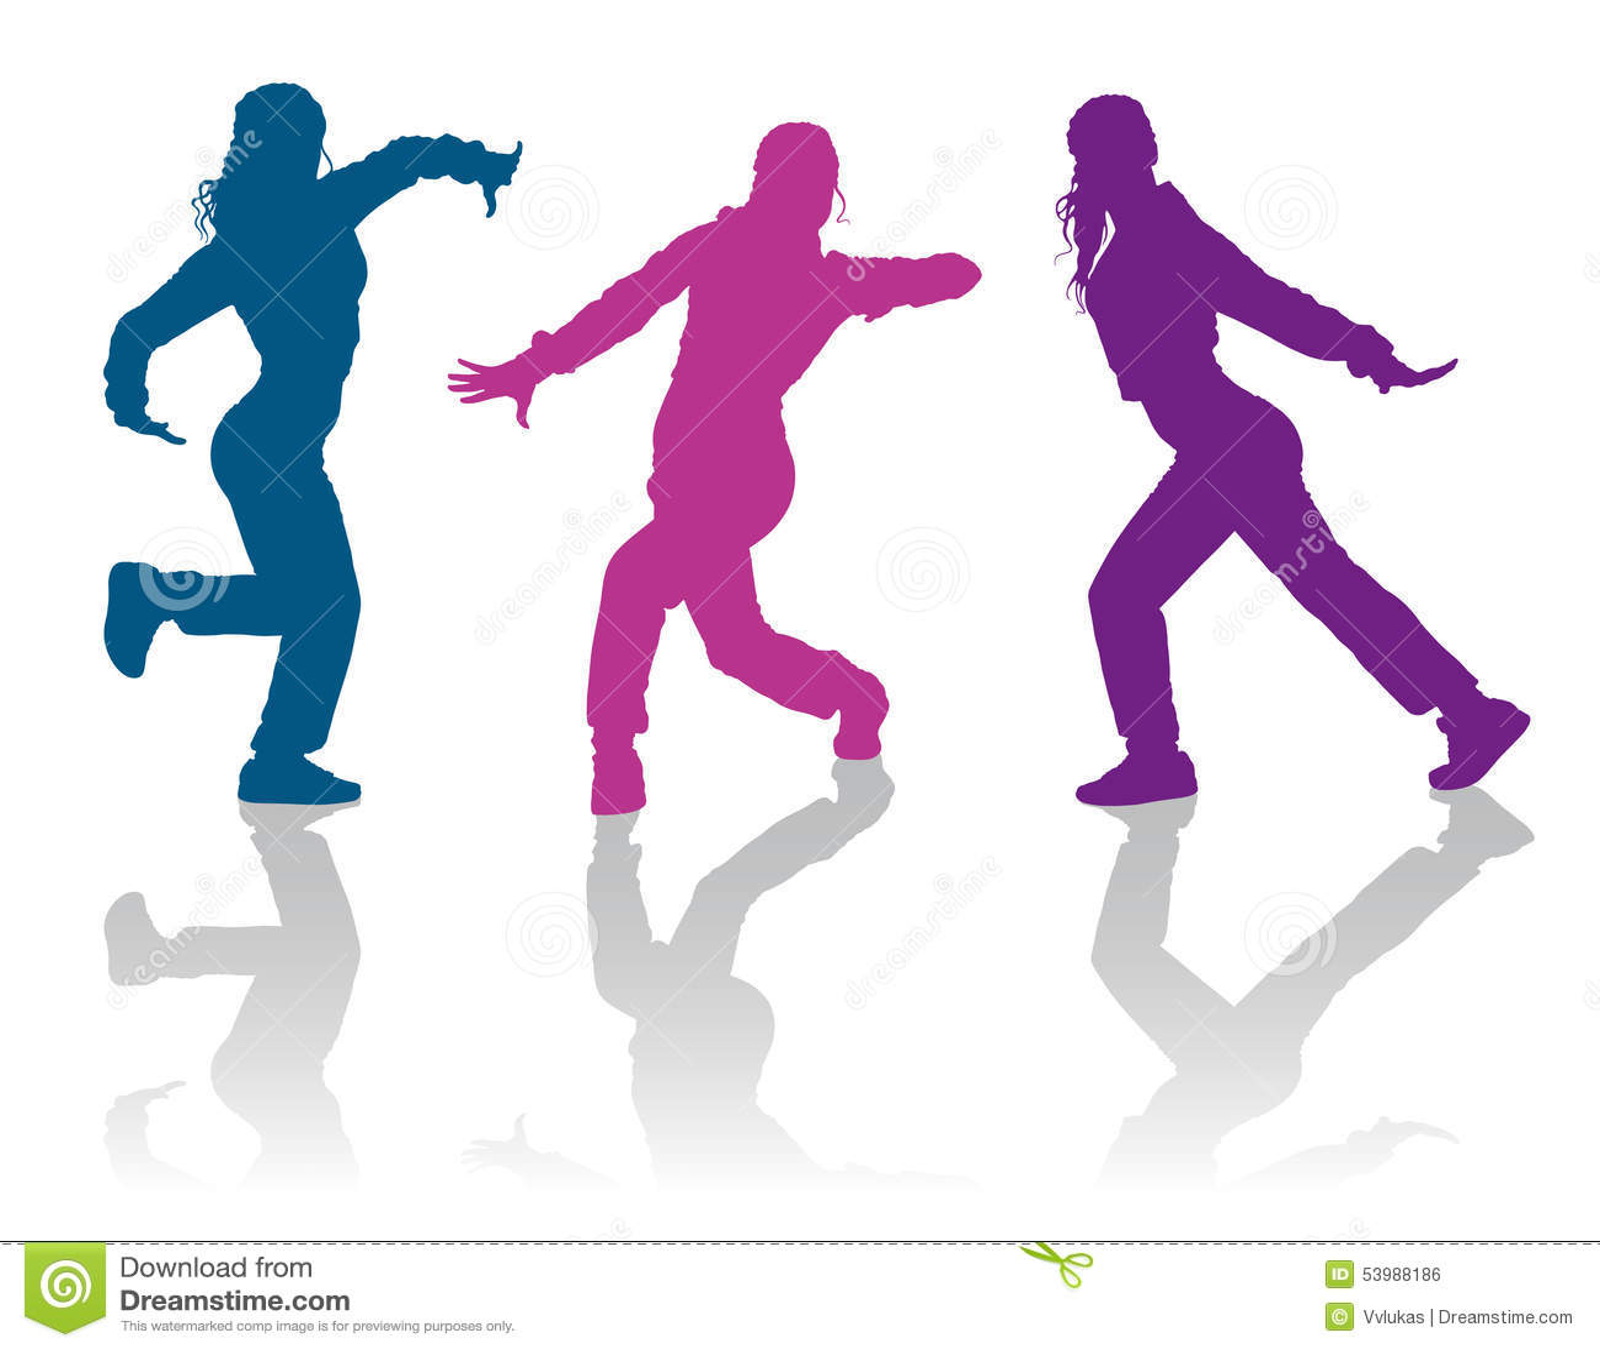 hip hop dancing girls stock vector illustration of dancing 53988186 rh dreamstime com hip hop dance pictures clip art hip hop dance pictures clip art